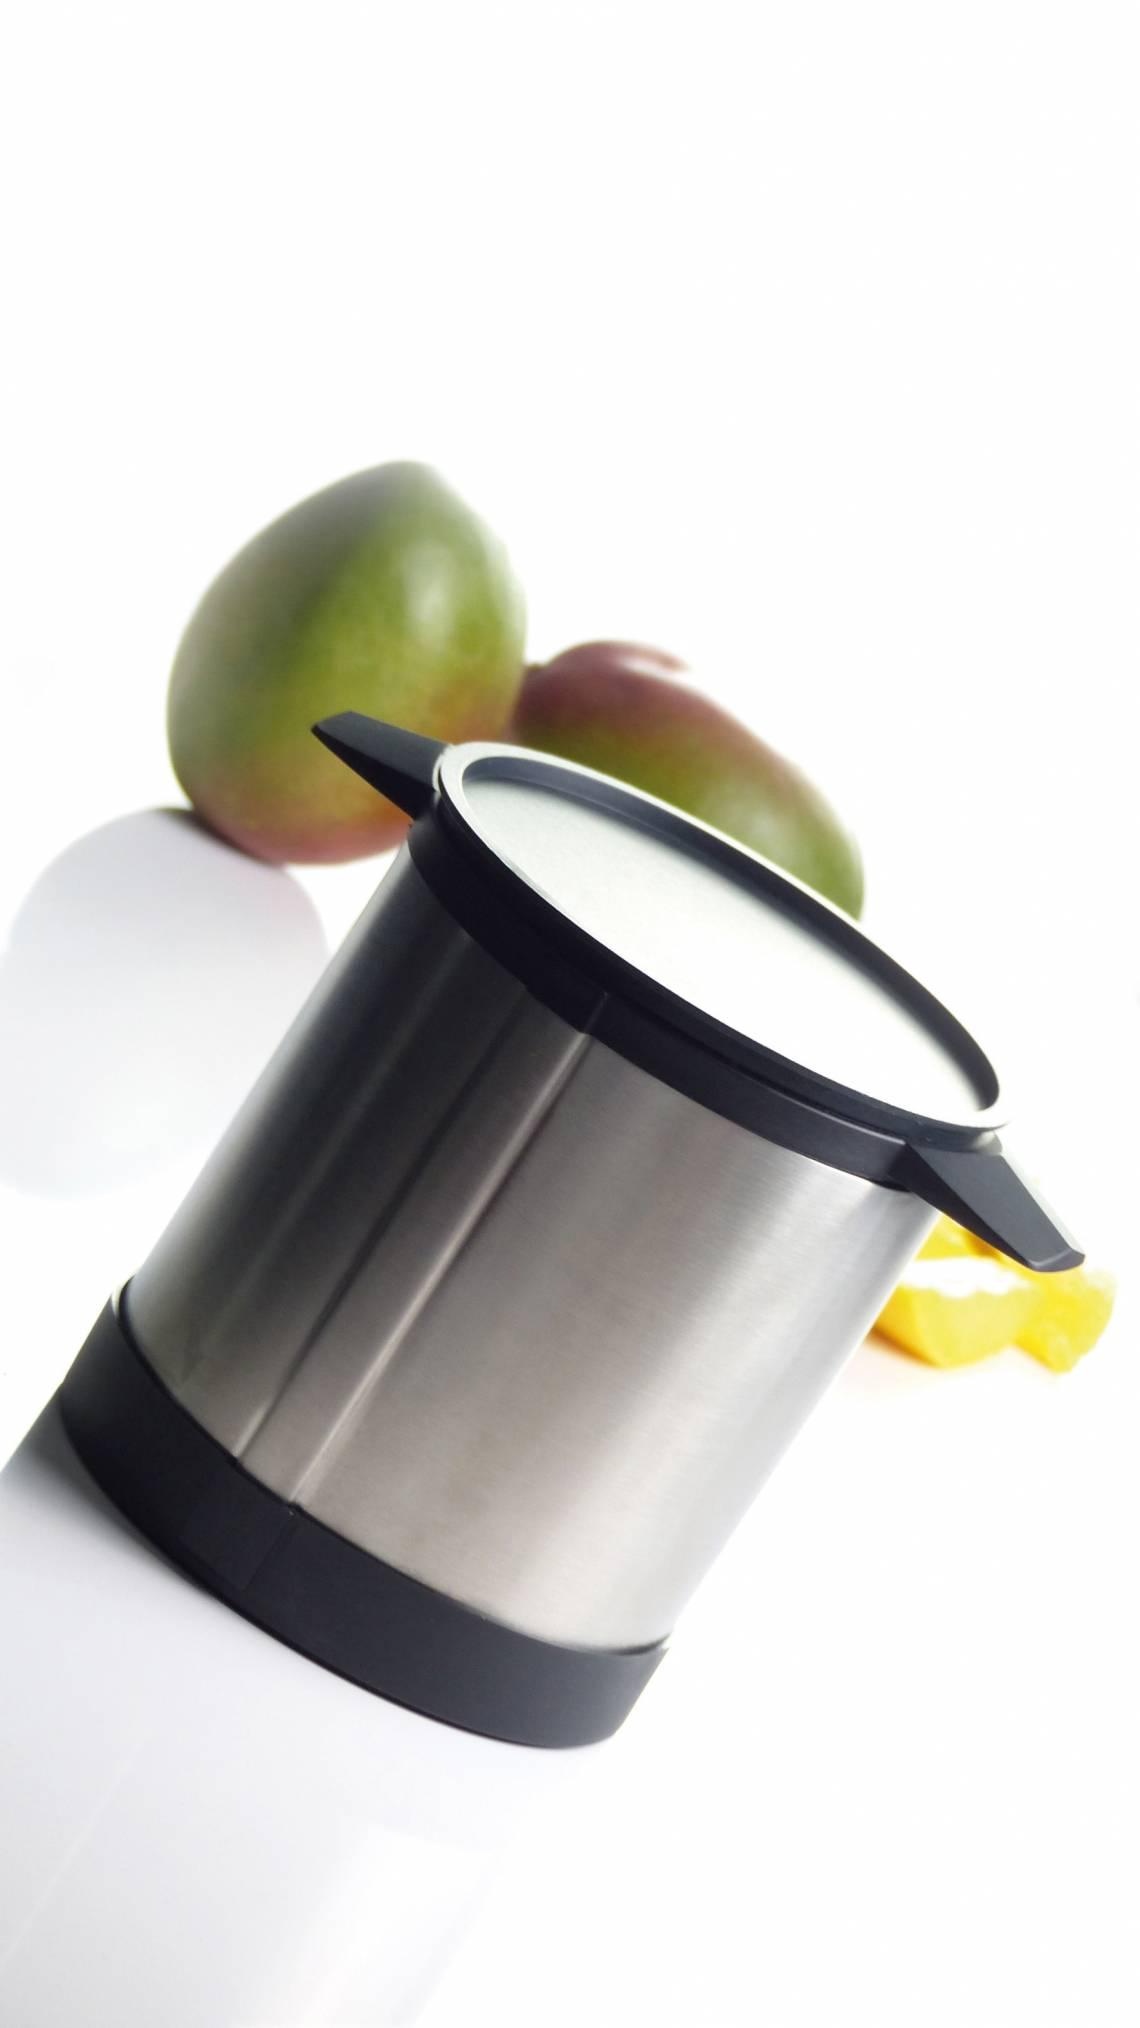 homiez mangoWhizz Mangoschneider 4